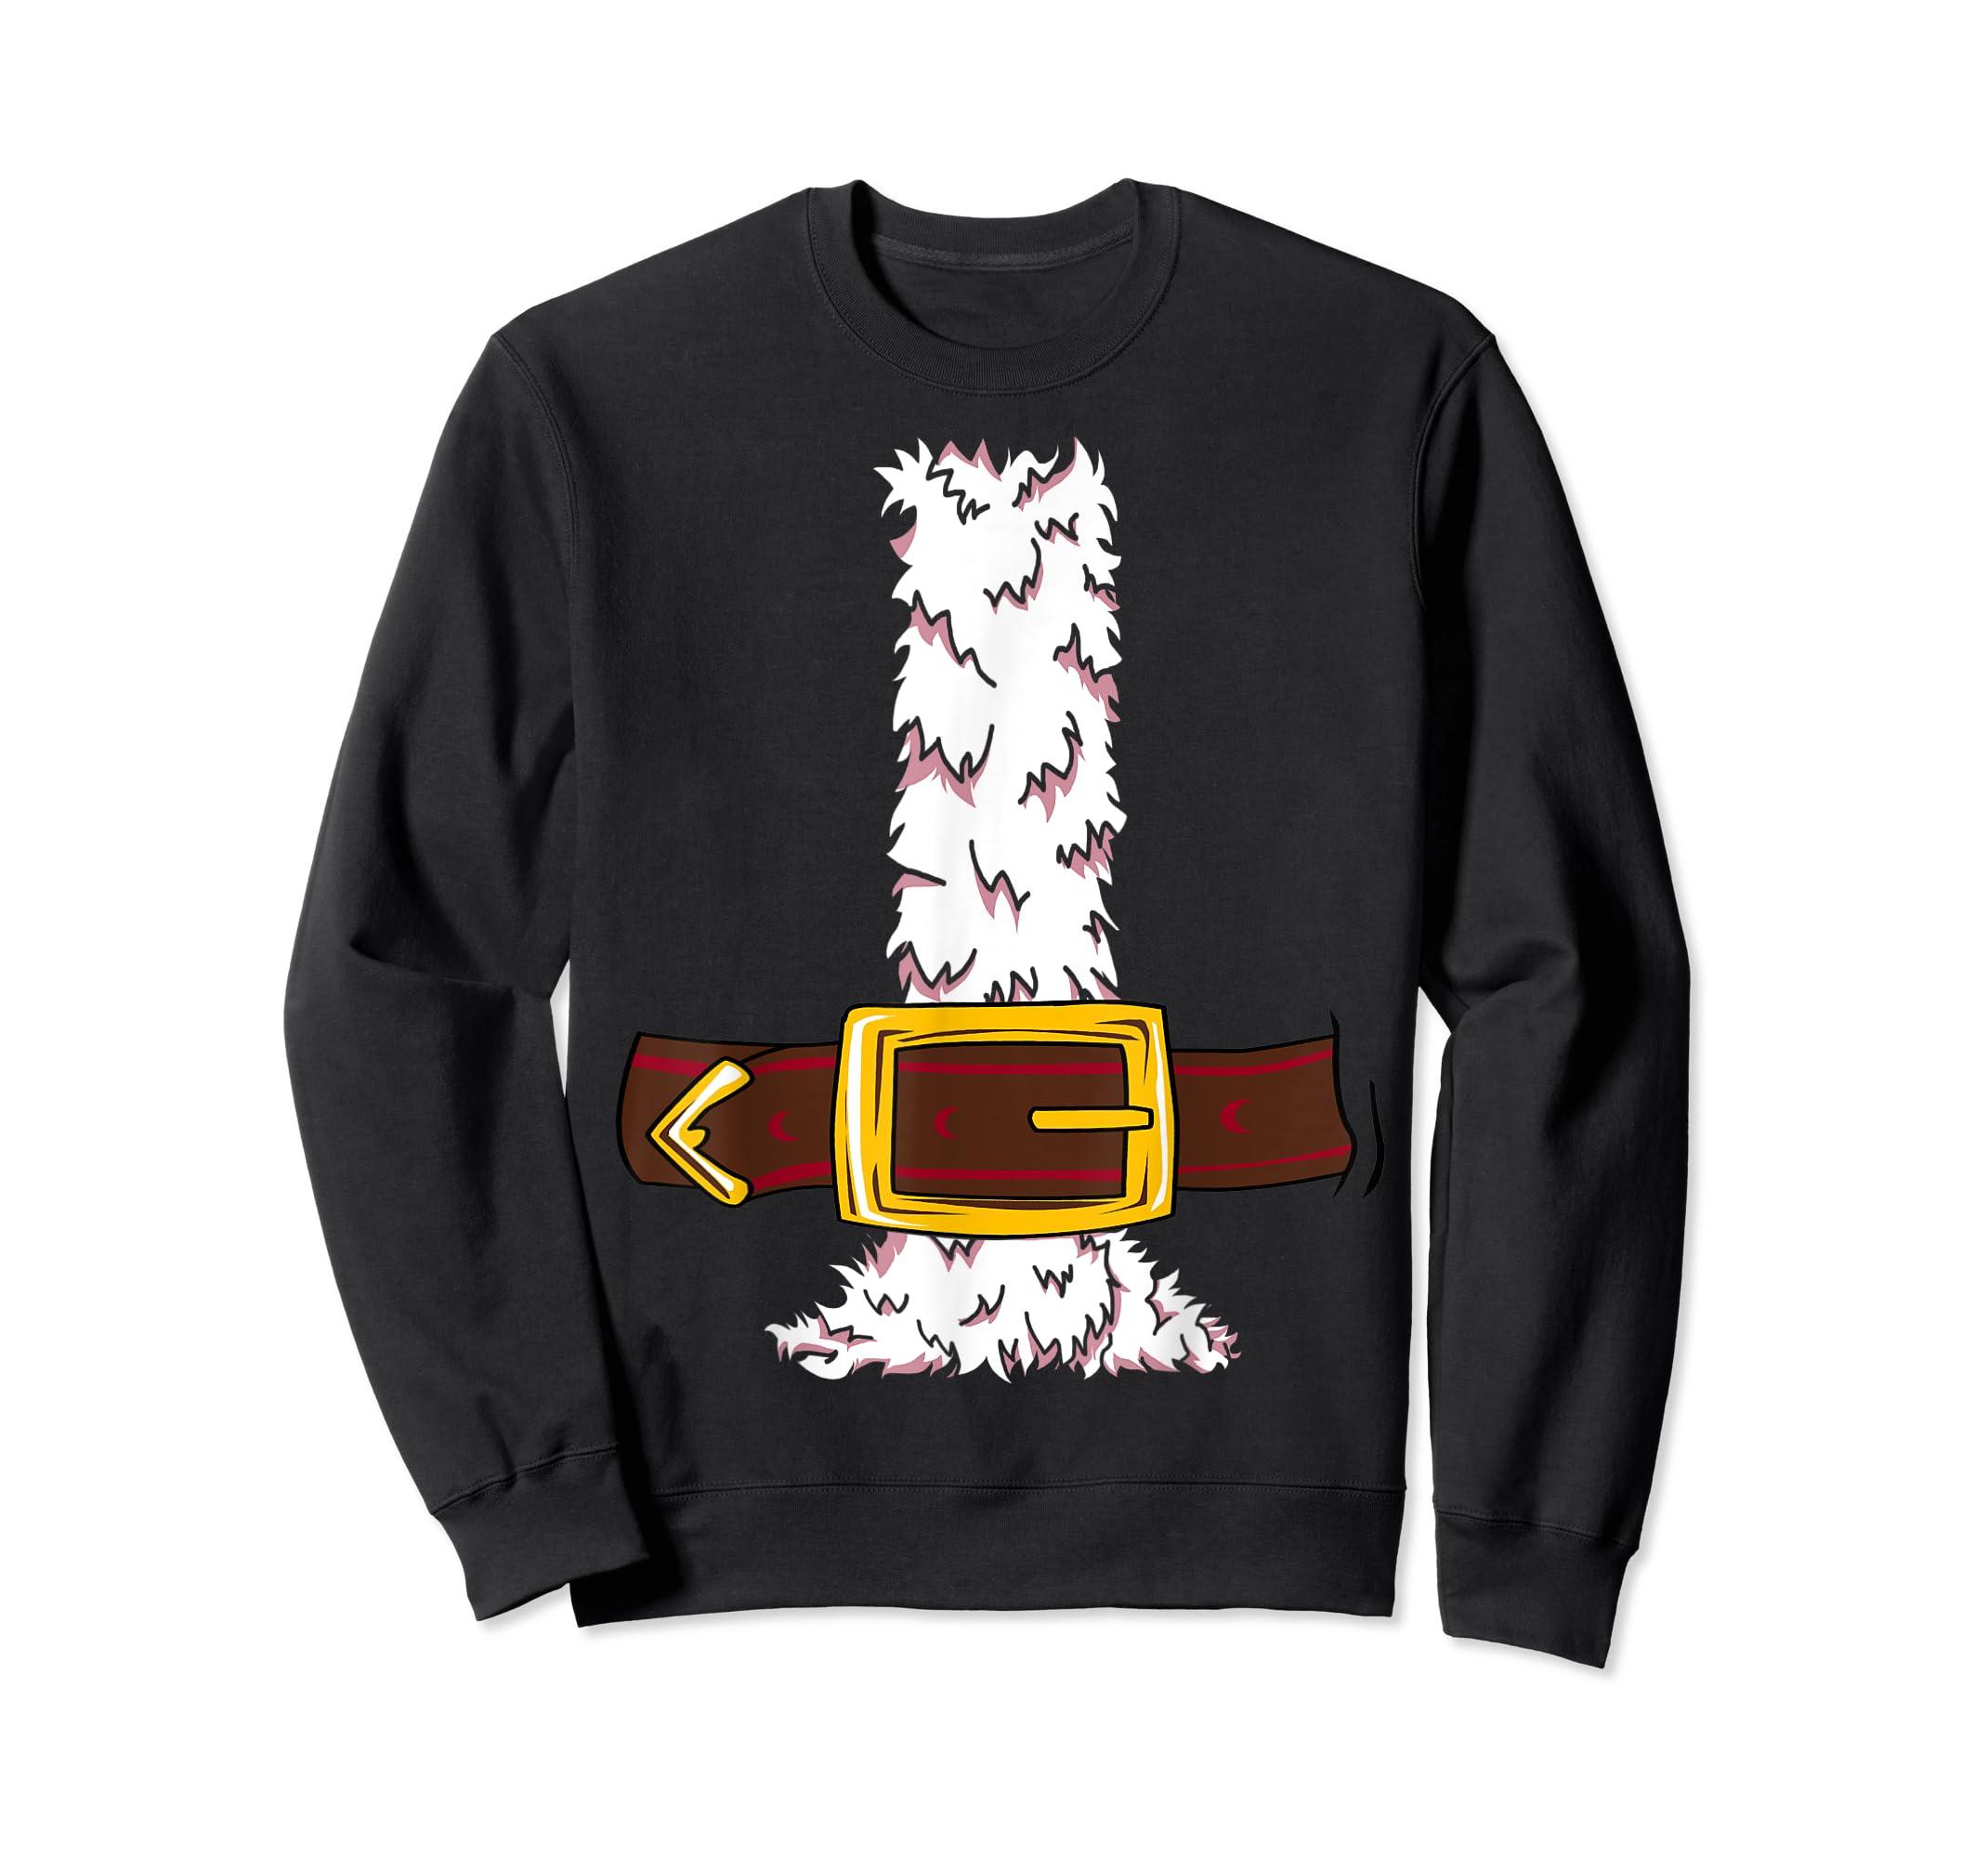 Funny Christmas gift for boys girls men women Santa costume T-Shirt-Sweatshirt-Black